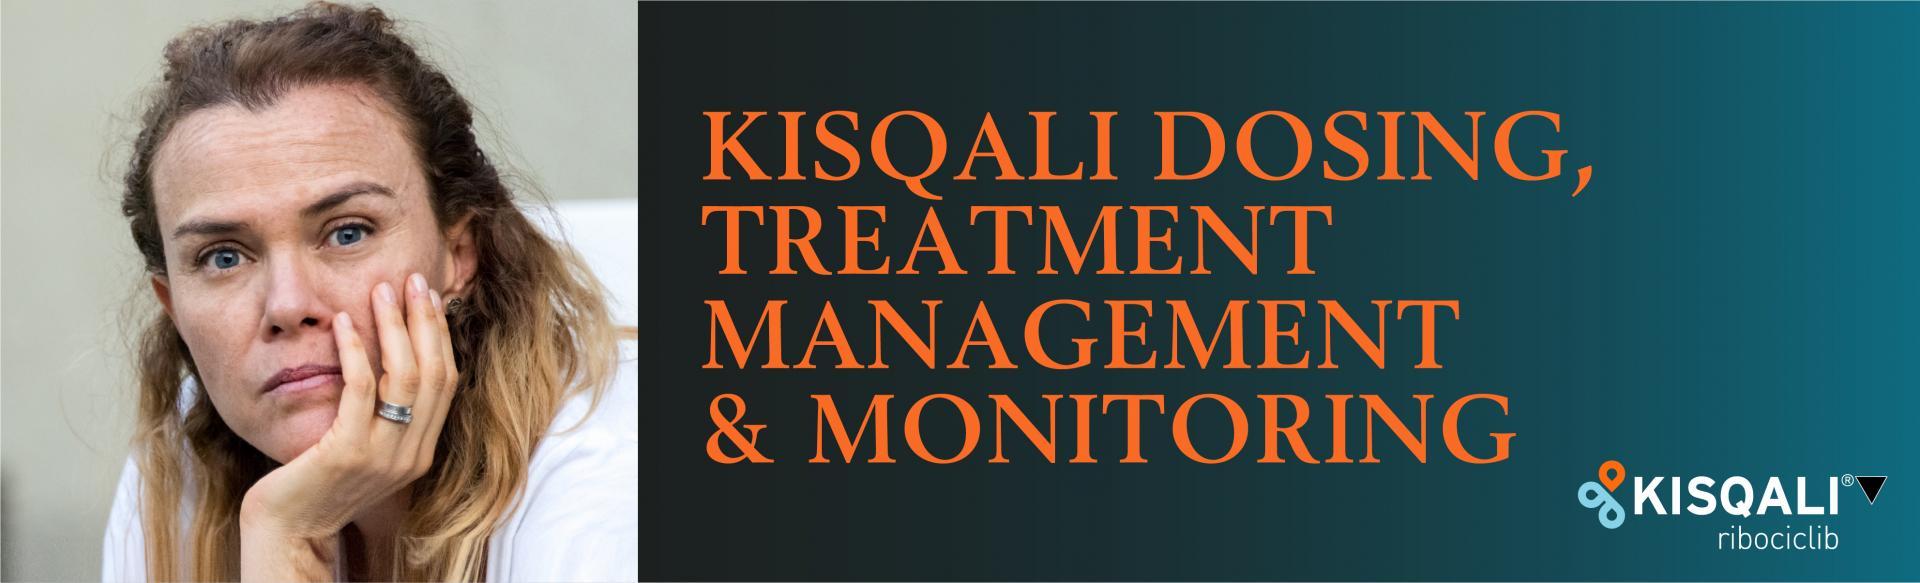 Woman headshot − KISQALI DOSING, TREATMENT, MANAGEMENT & MONITORING Dose adjustments